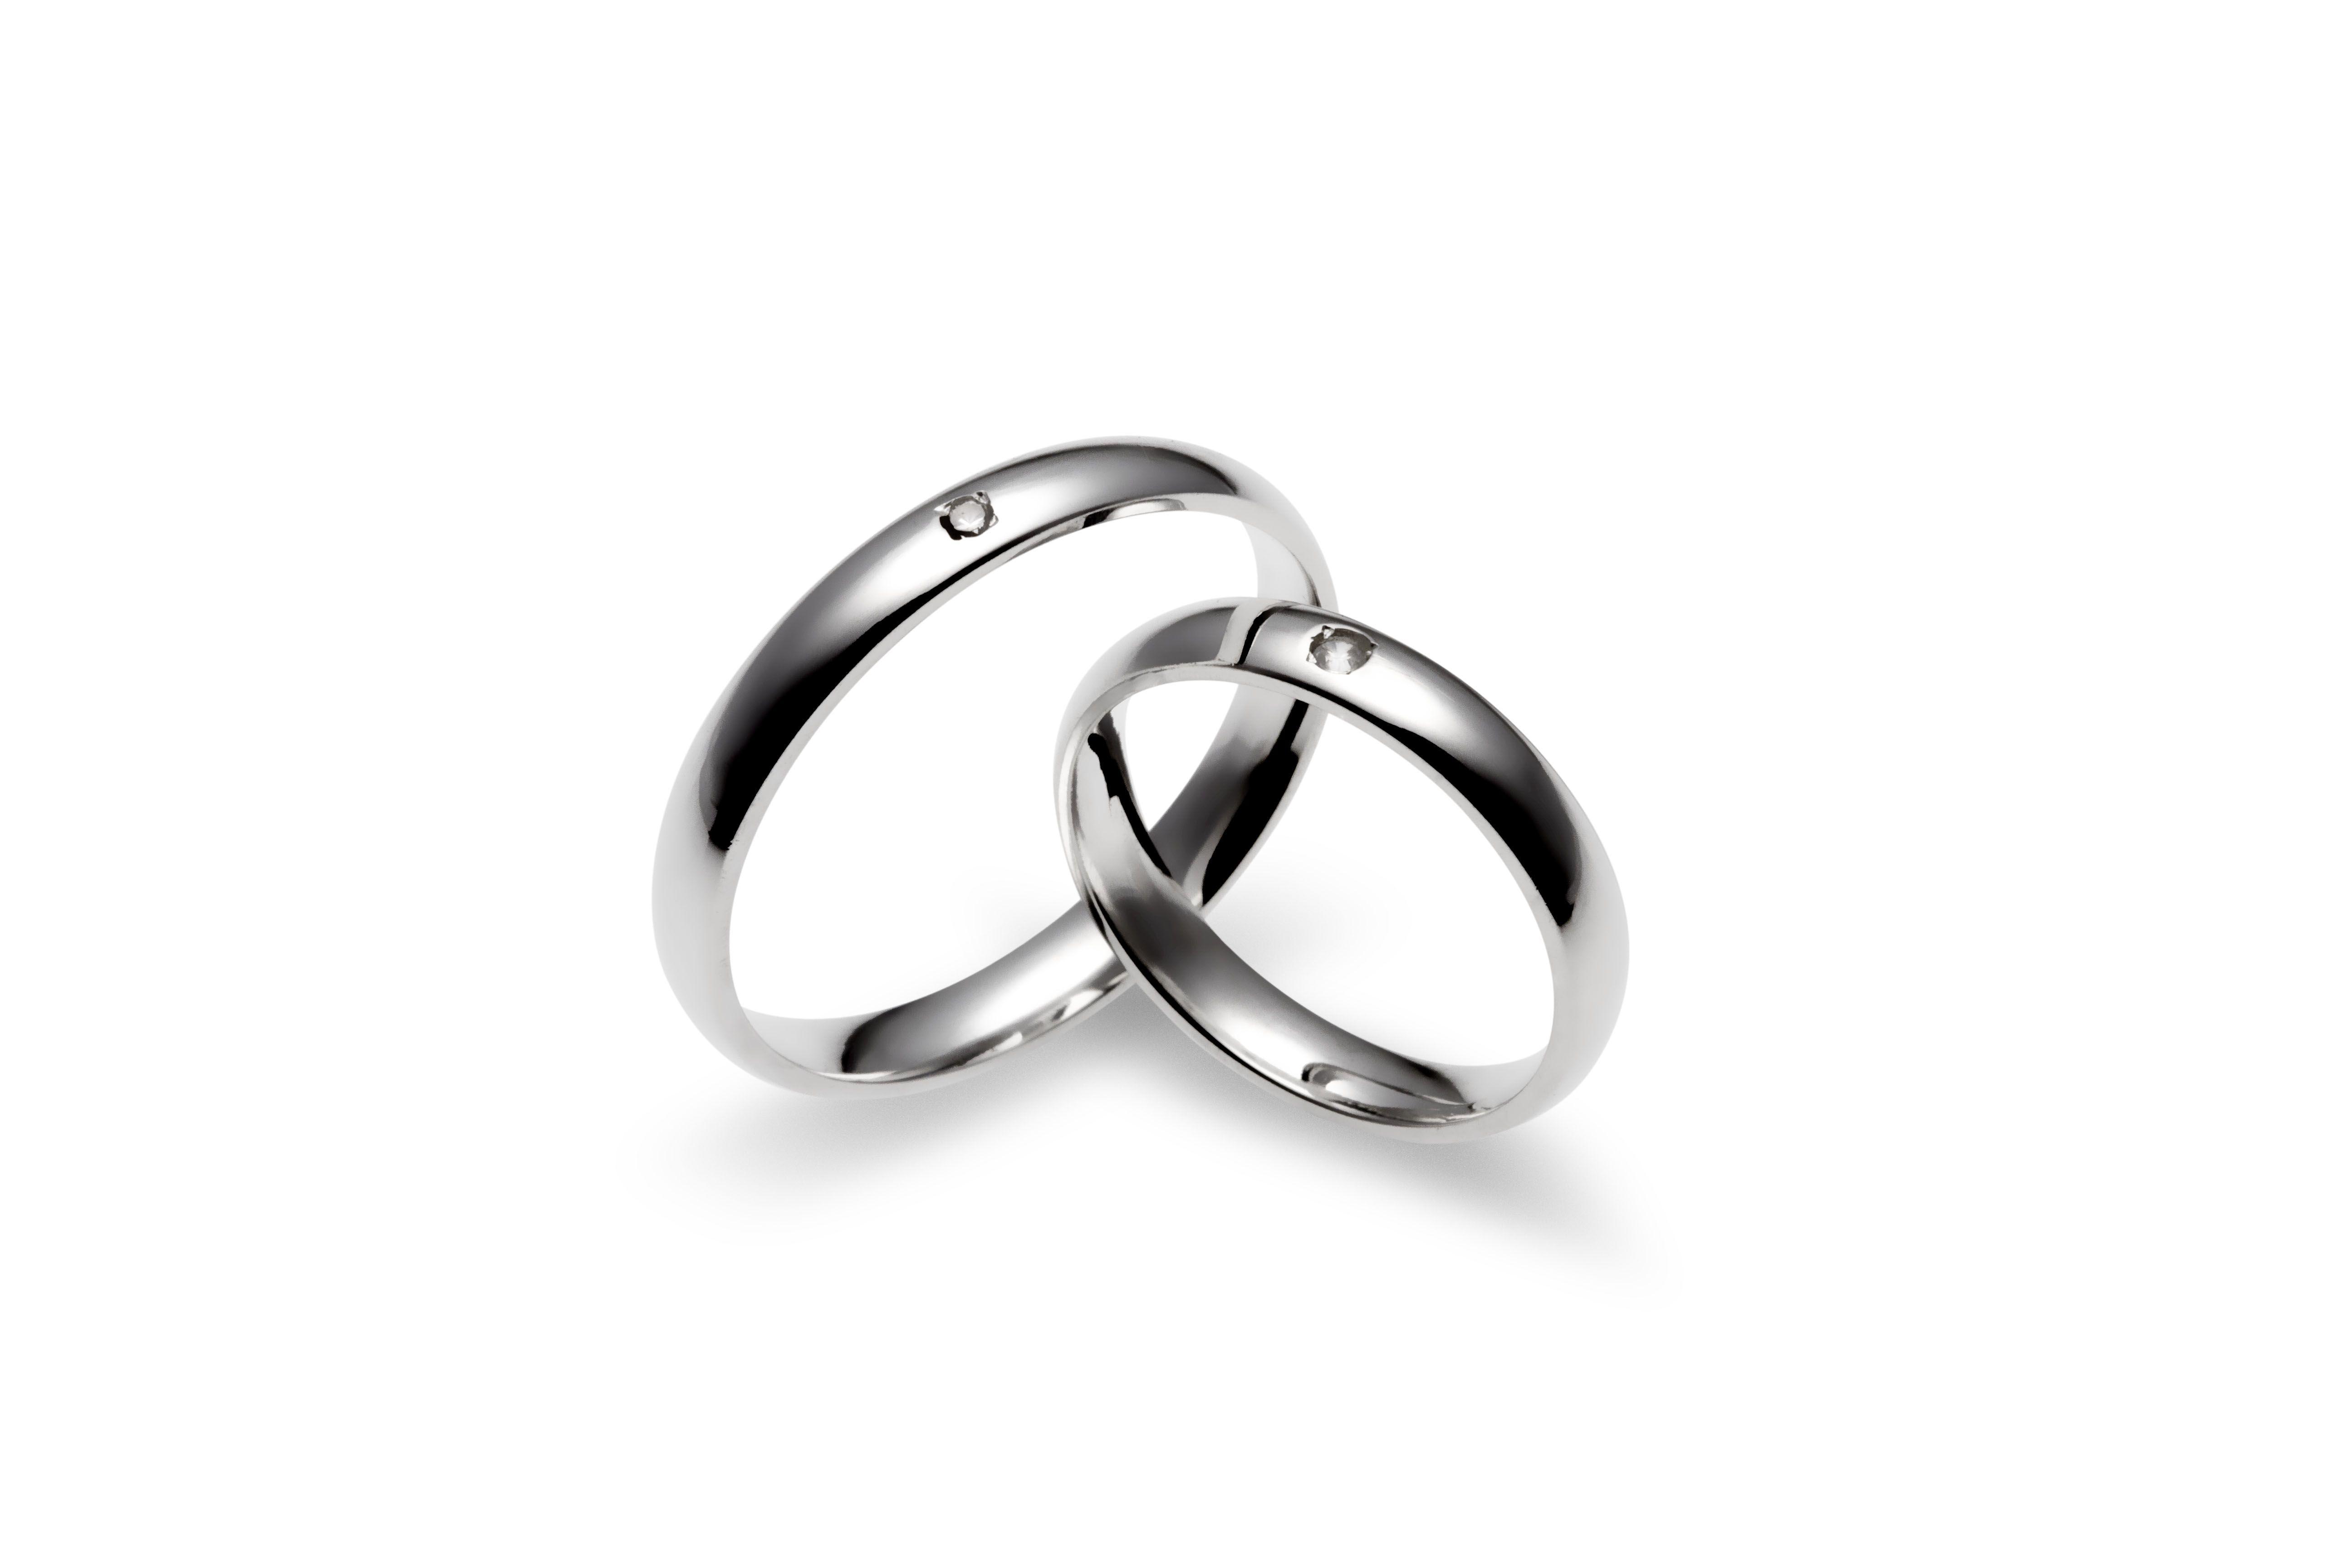 778d703203f Aliança em Prata com Zircônia Fina  ring  silver  jewelry  anel  namoro